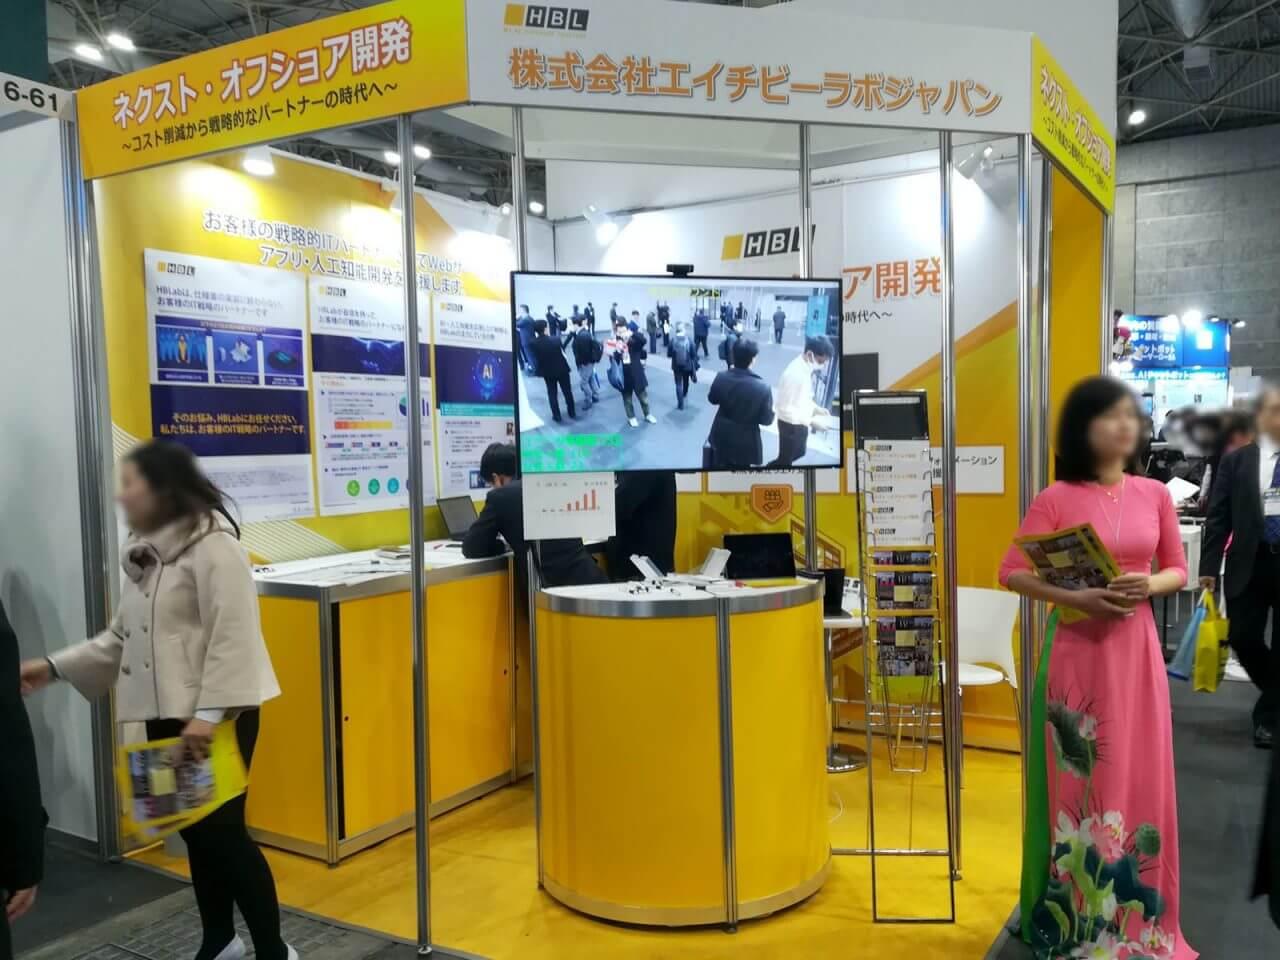 ■HBLAB JAPAN株式会社/Webシステム、アプリ、人工知能開発|人工知能を搭載した製品・サービスの比較一覧・導入活用事例・資料請求が無料でできるAIポータルメディア